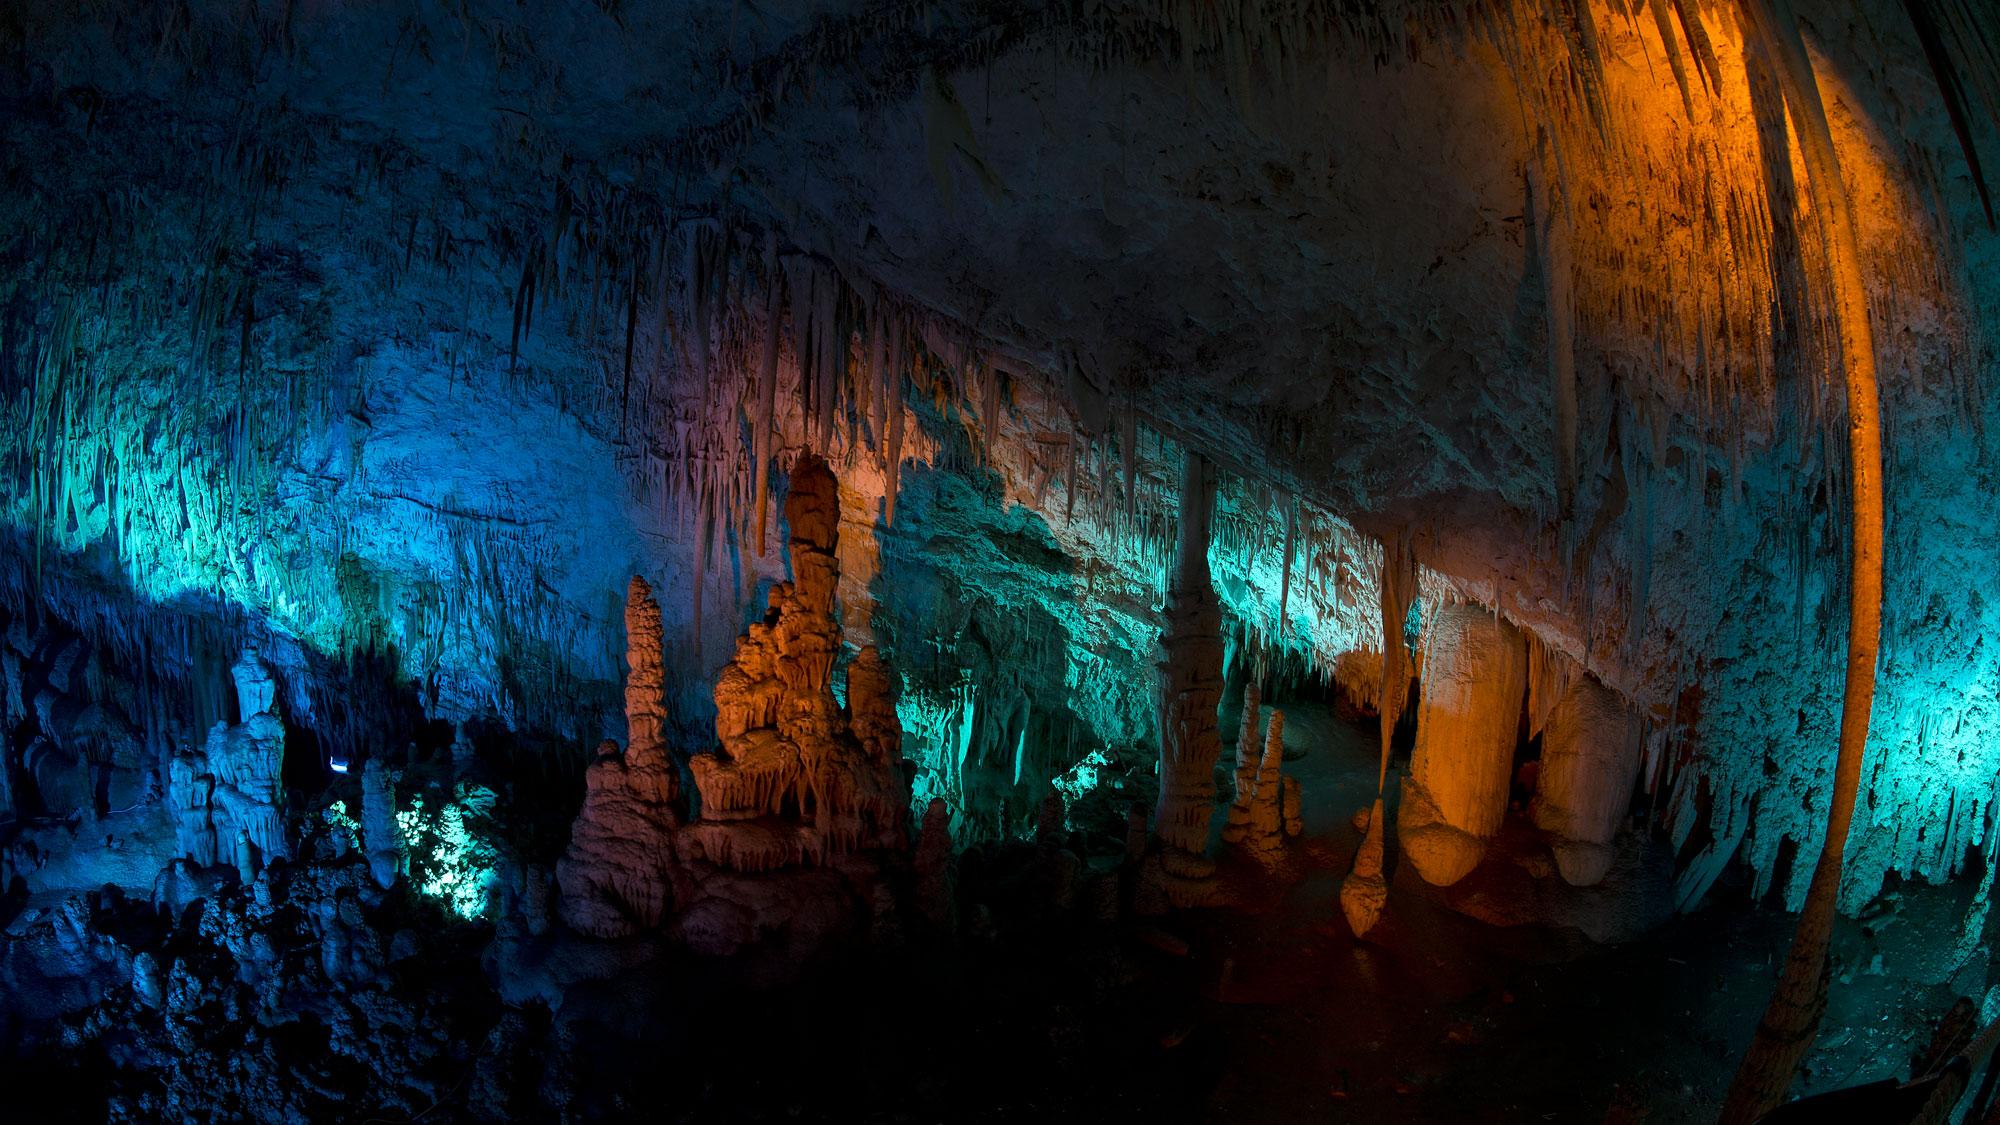 Stalactite Cave, Bet Shemesh - Israel